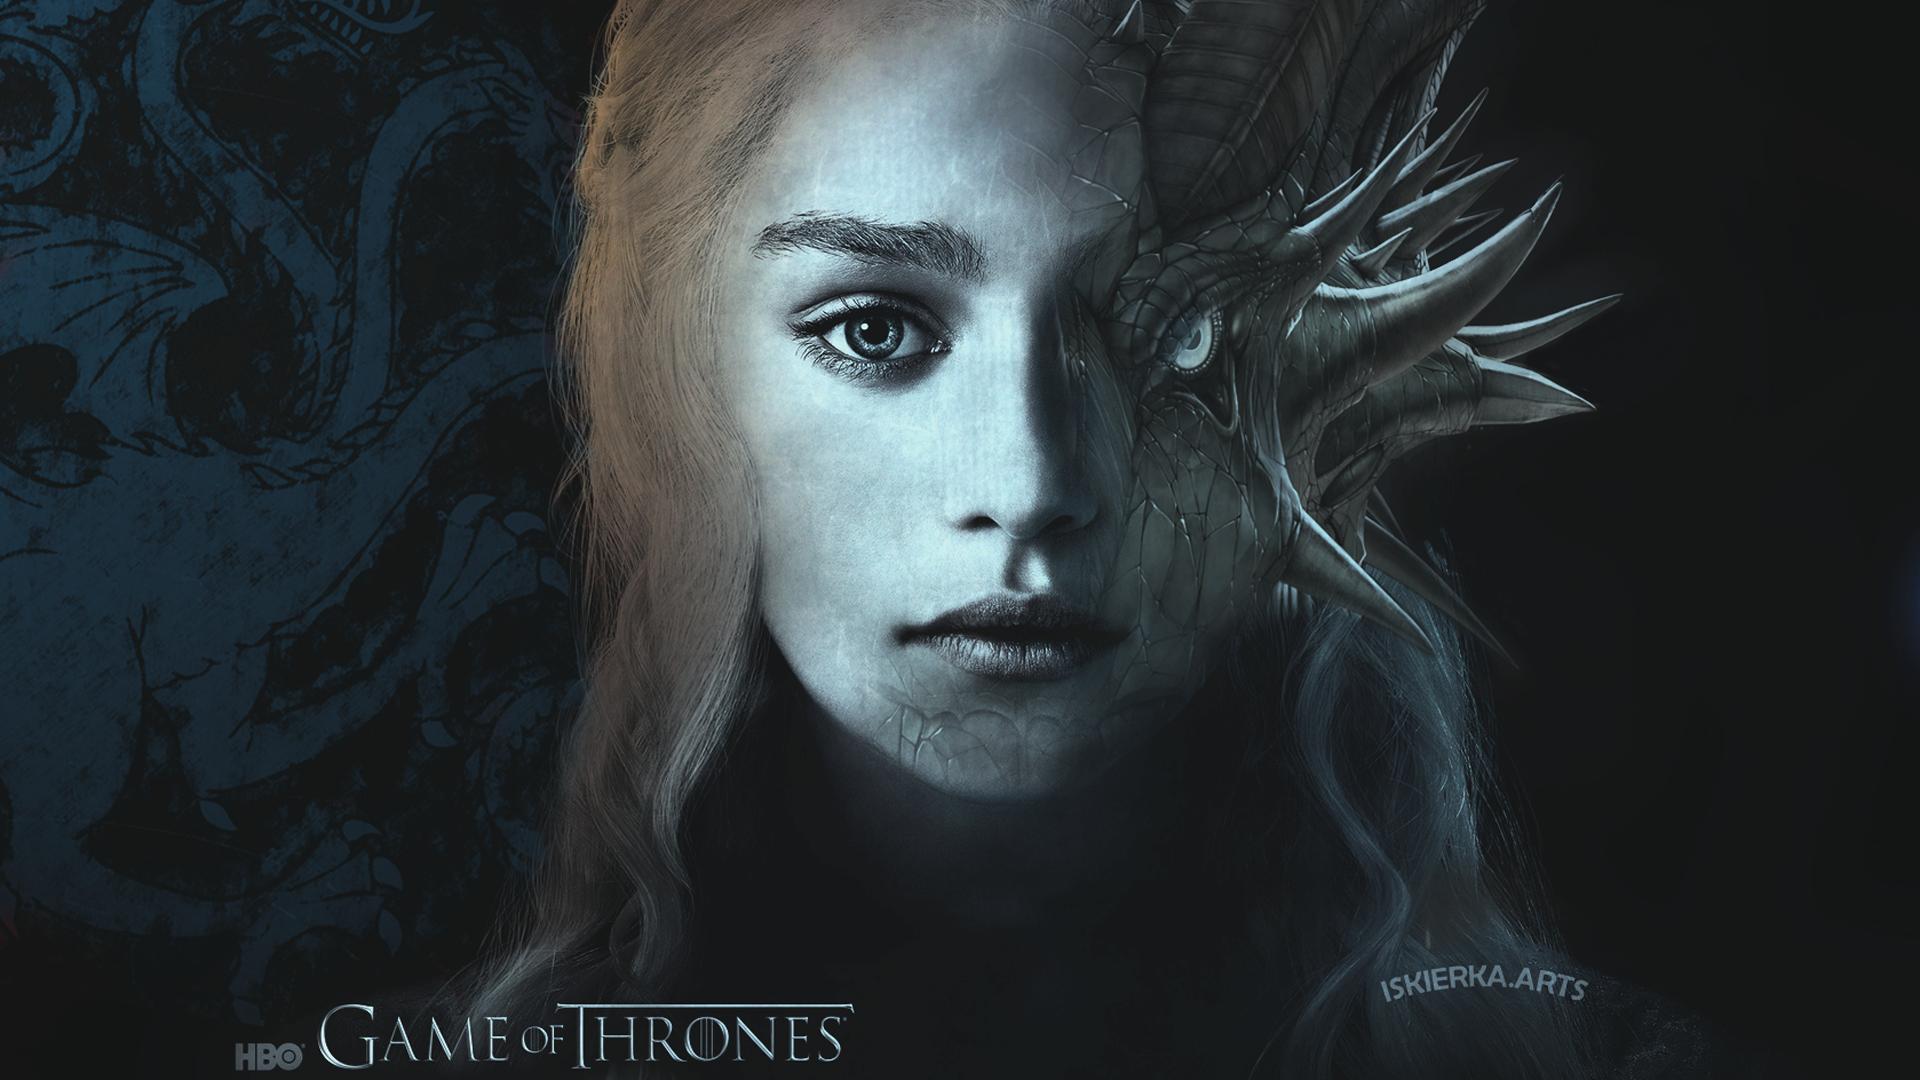 Daenerys Game of Thrones Wallpaper 1920x1080 by Iskierka0 on 1920x1080